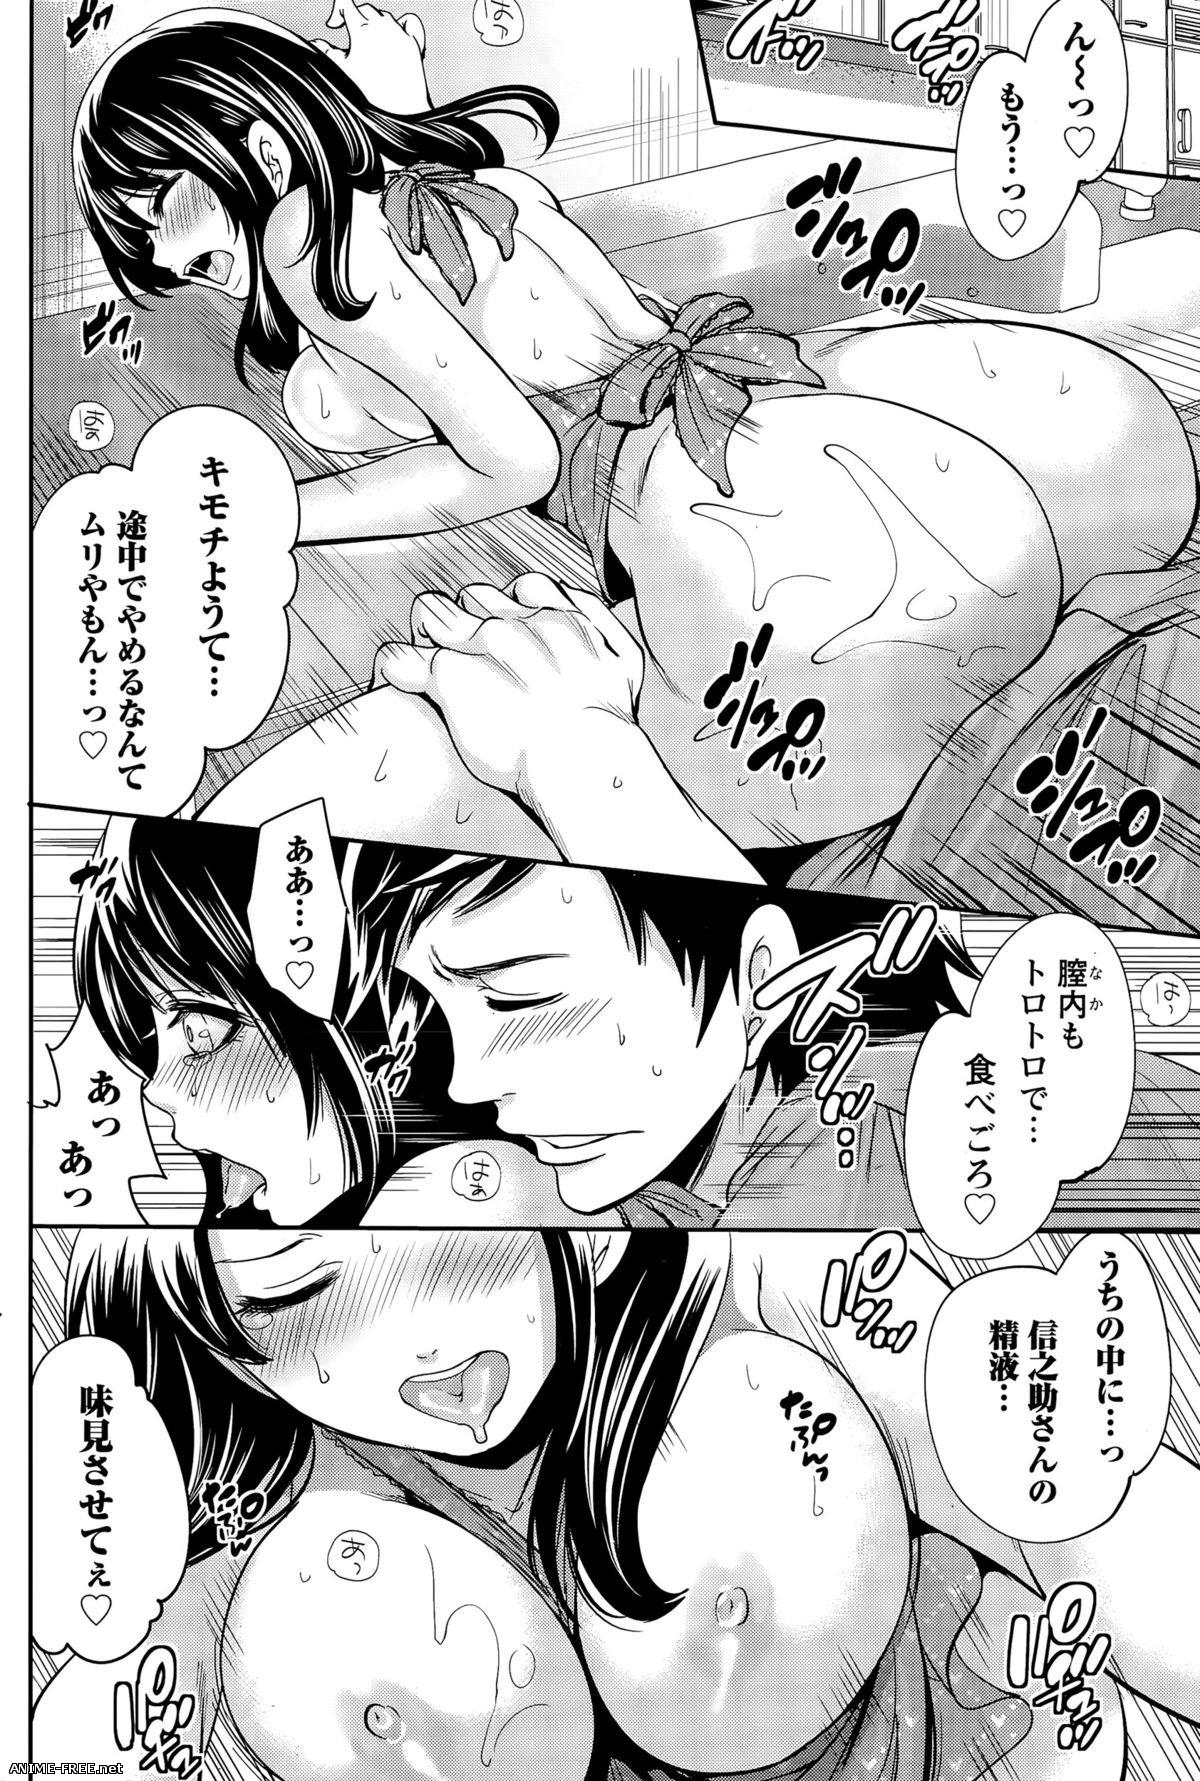 Miyahara Ayumu - ��������� ����� [Cen] [JAP,ENG,RUS,CHI] Manga Hentai